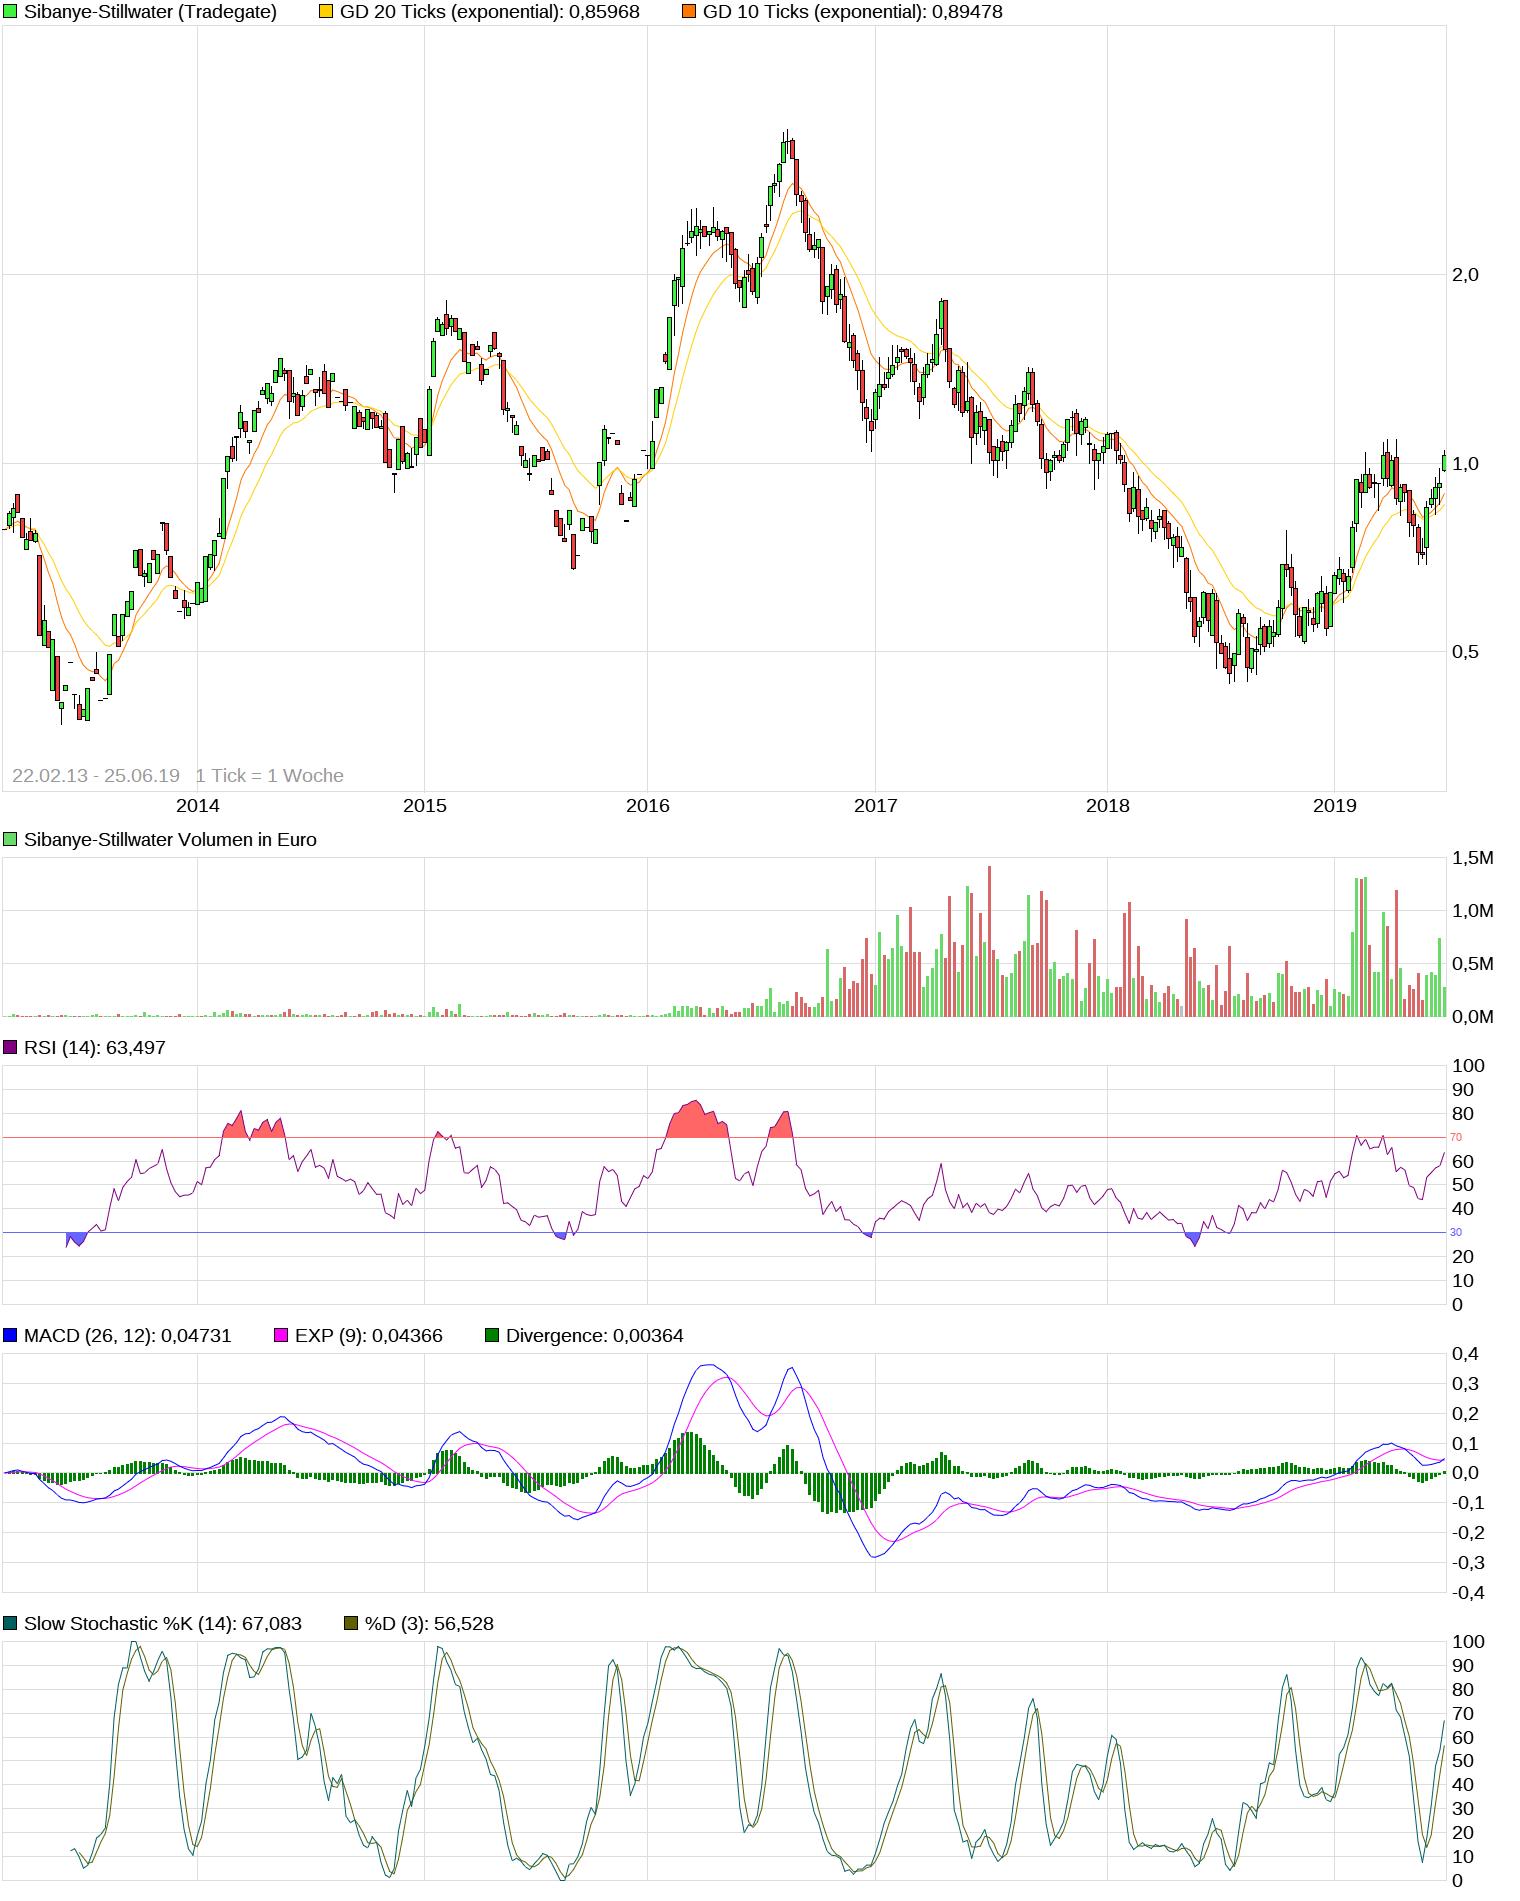 chart_10years_sibanye-stillwater-1.png